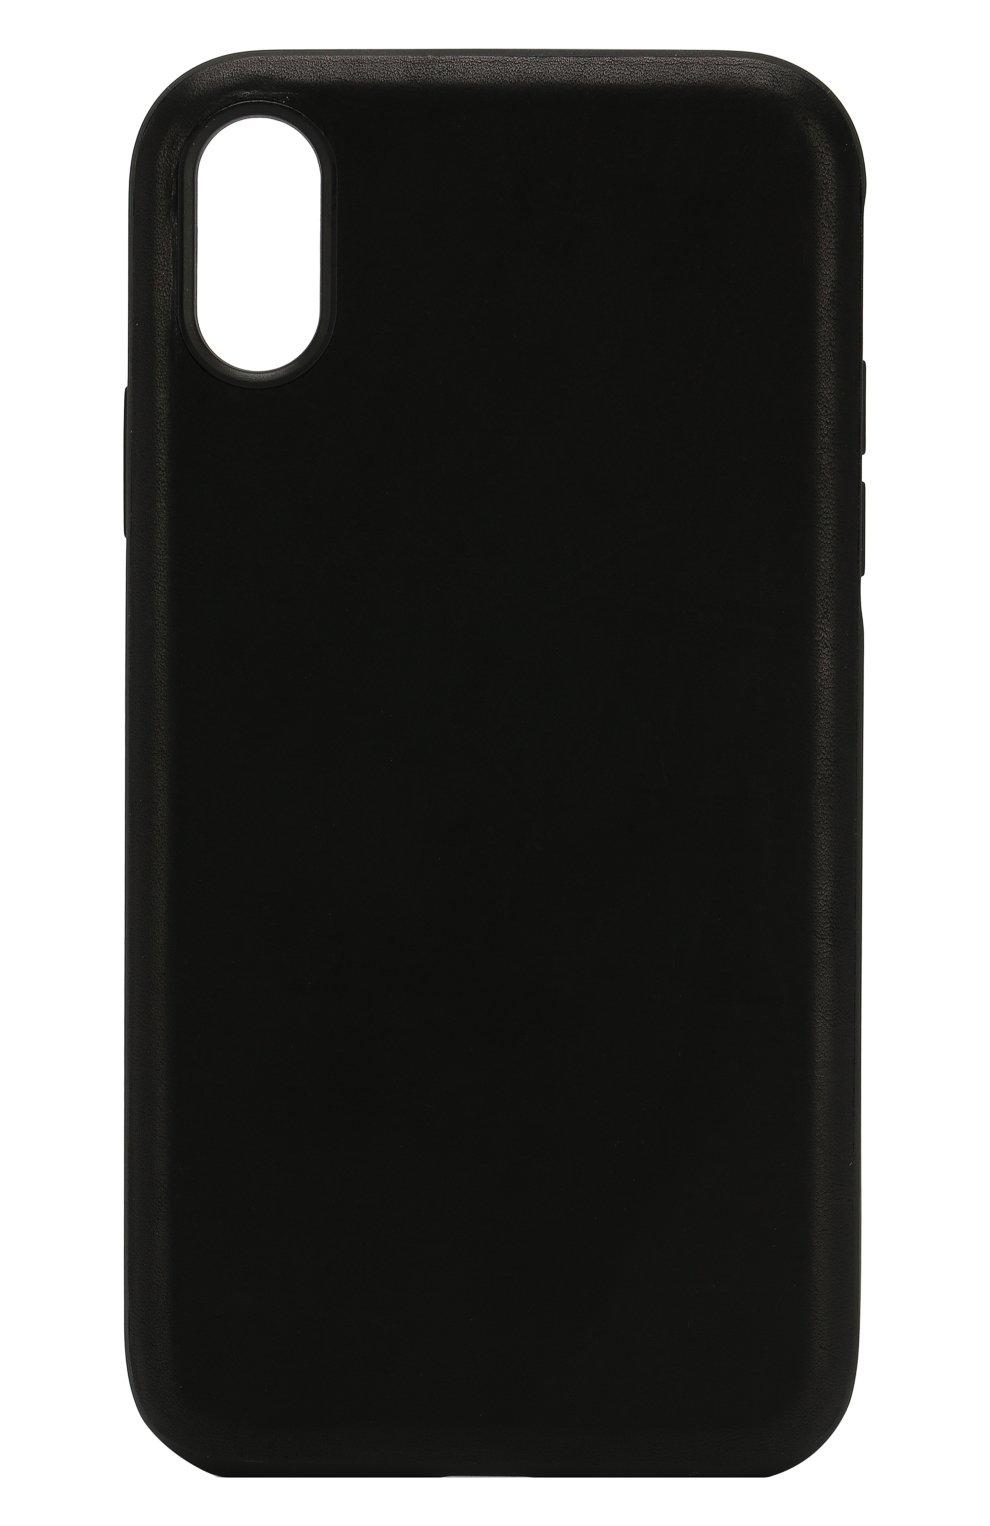 Мужской чехол для iphone xr NOMAD черного цвета, арт. NM21Q10000 | Фото 1